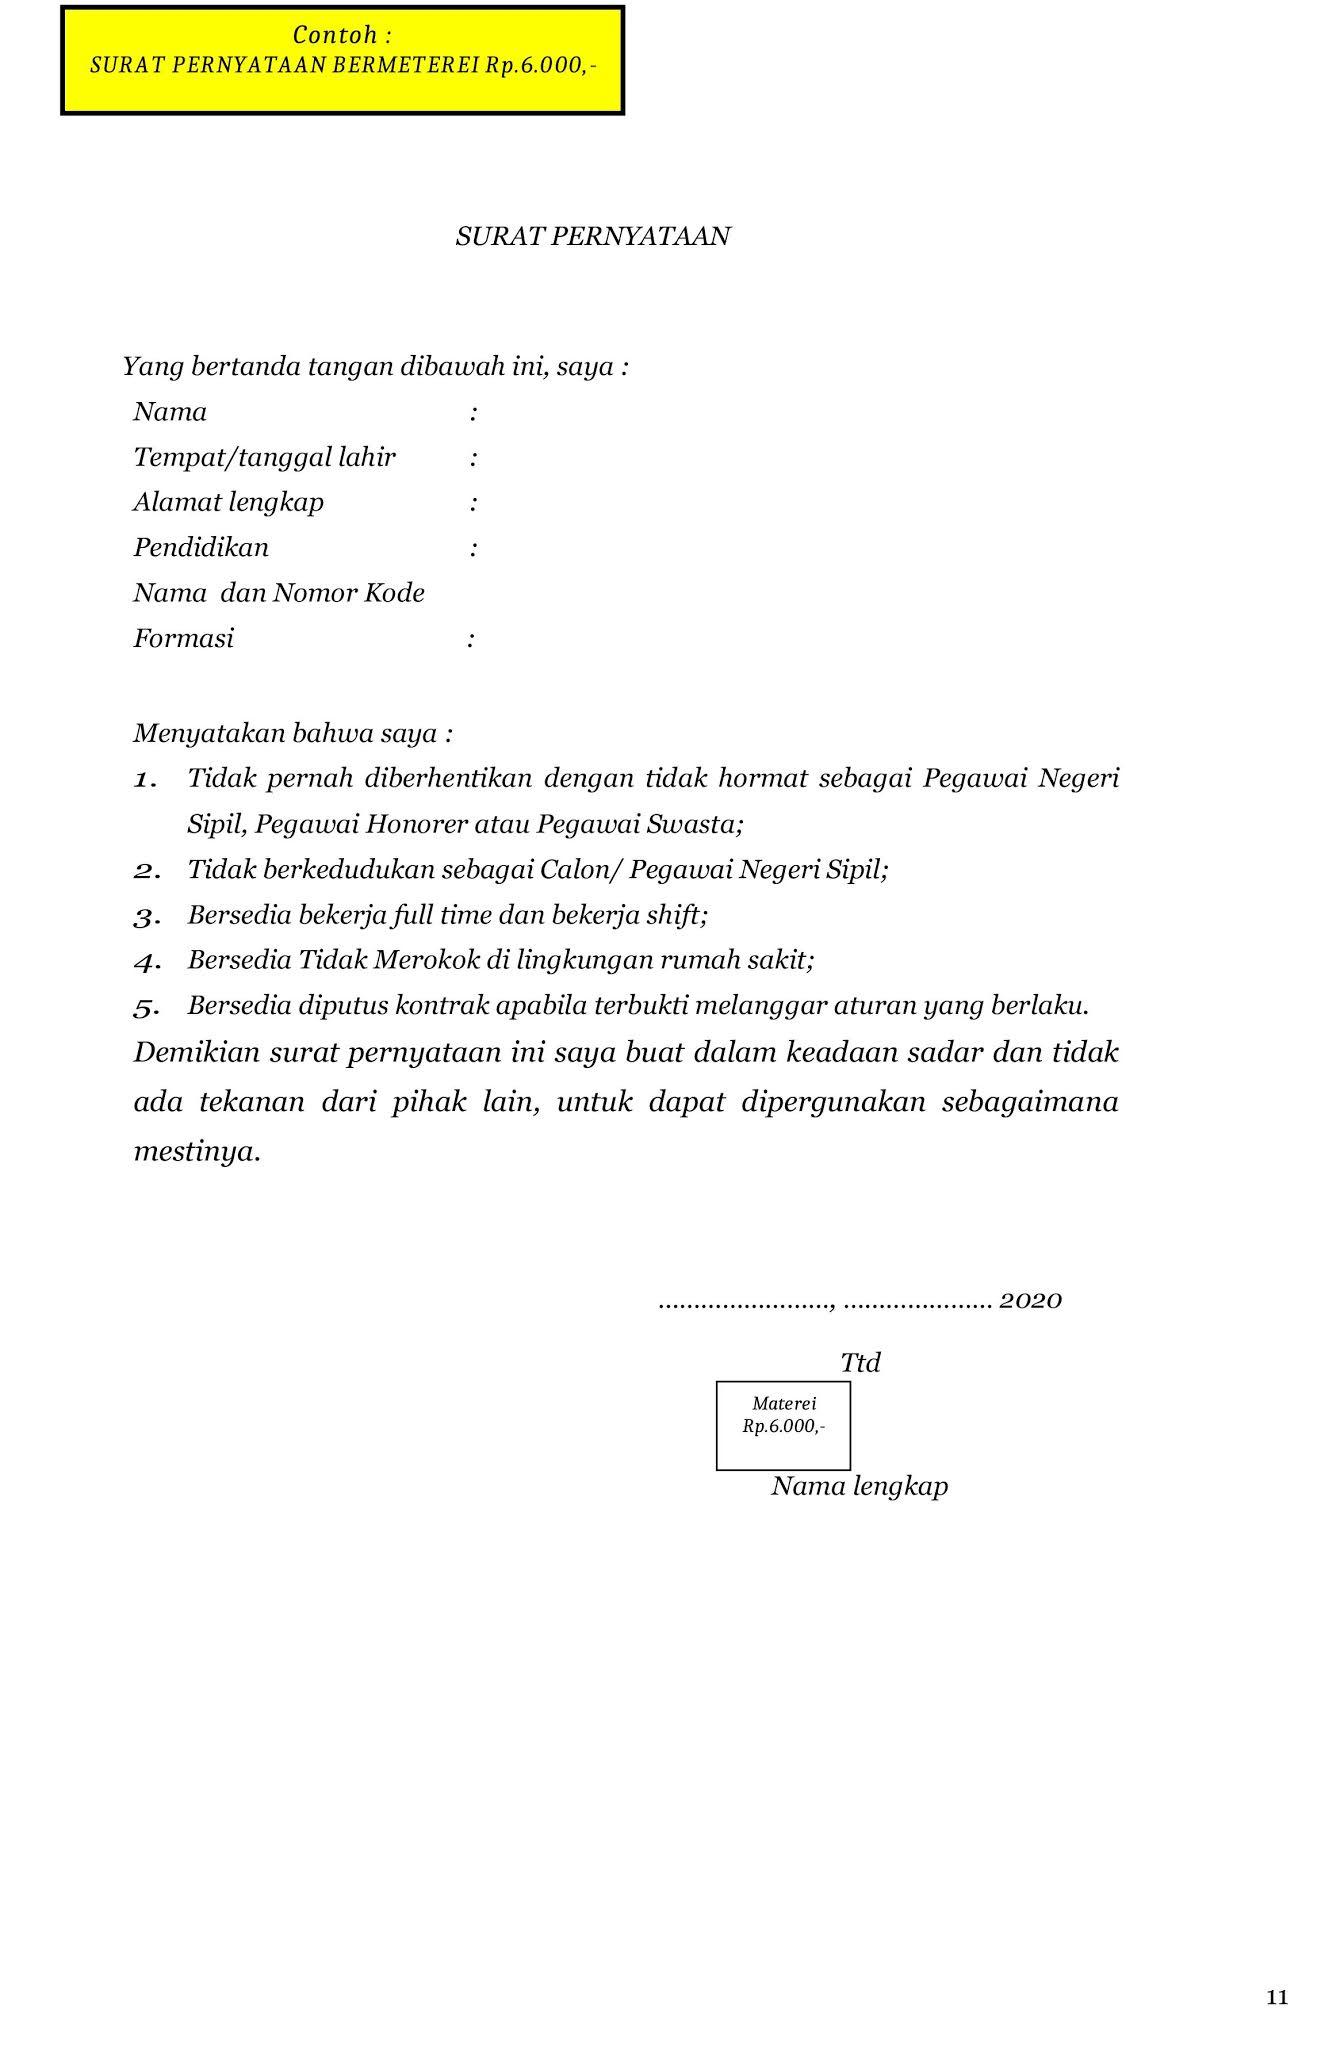 SURAT PERNYATAAN BERMETEREI Rp.6.000,-